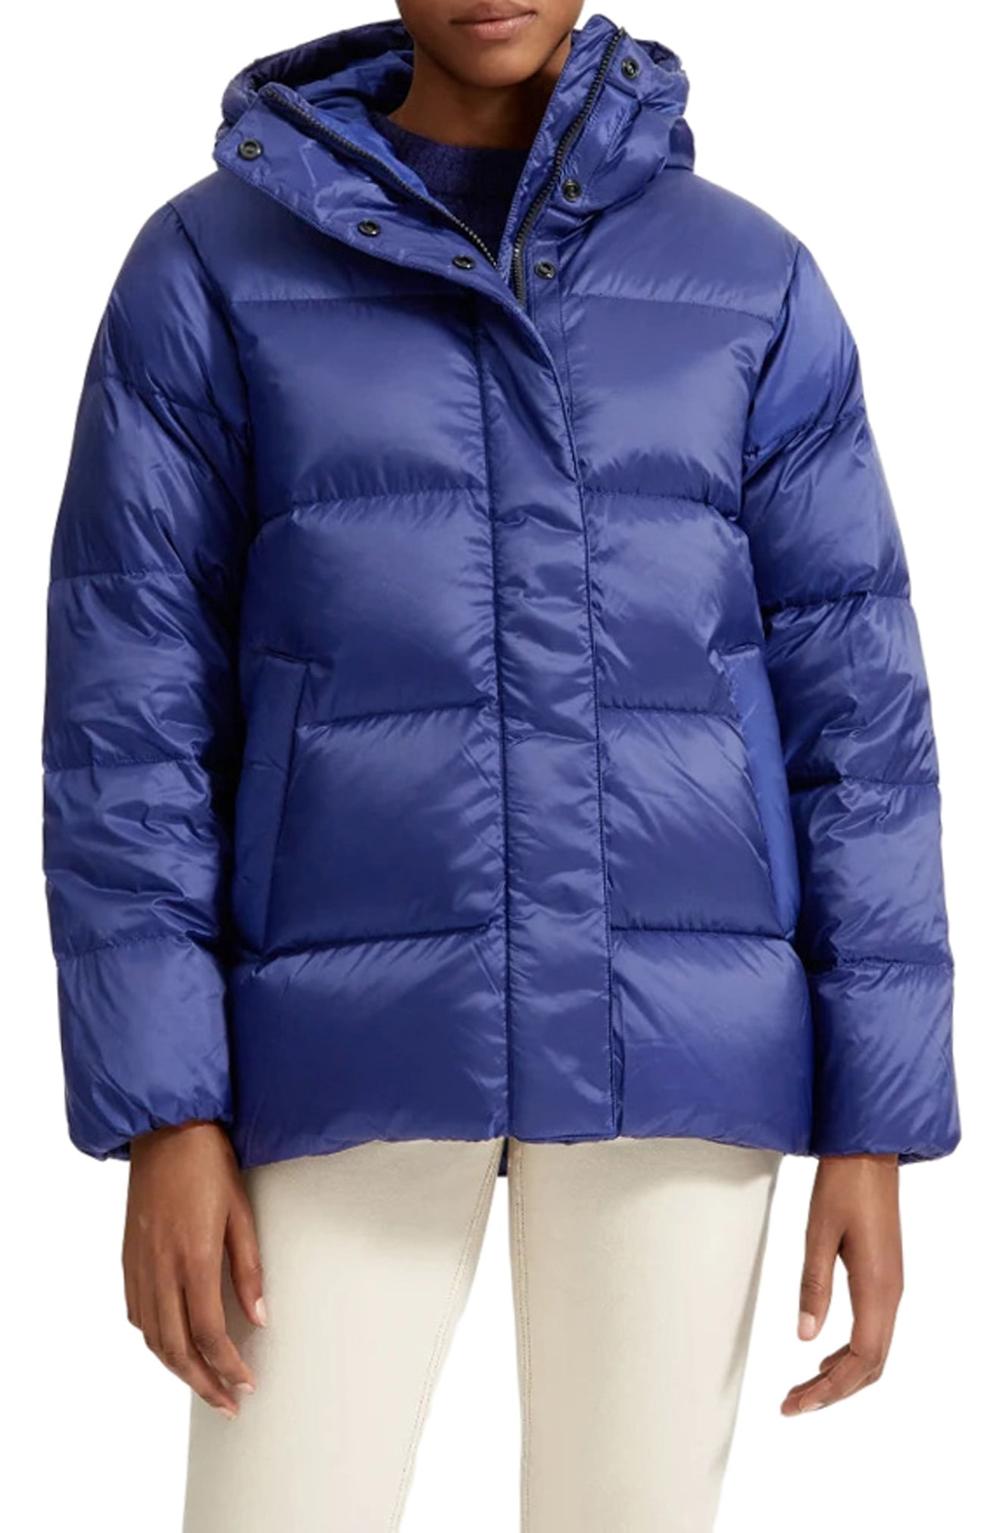 Everlane Re Down Puffy Puff Water Resistant Hooded Jacket Nordstrom Rack Hooded Jacket Jackets Everlane [ 1533 x 1000 Pixel ]